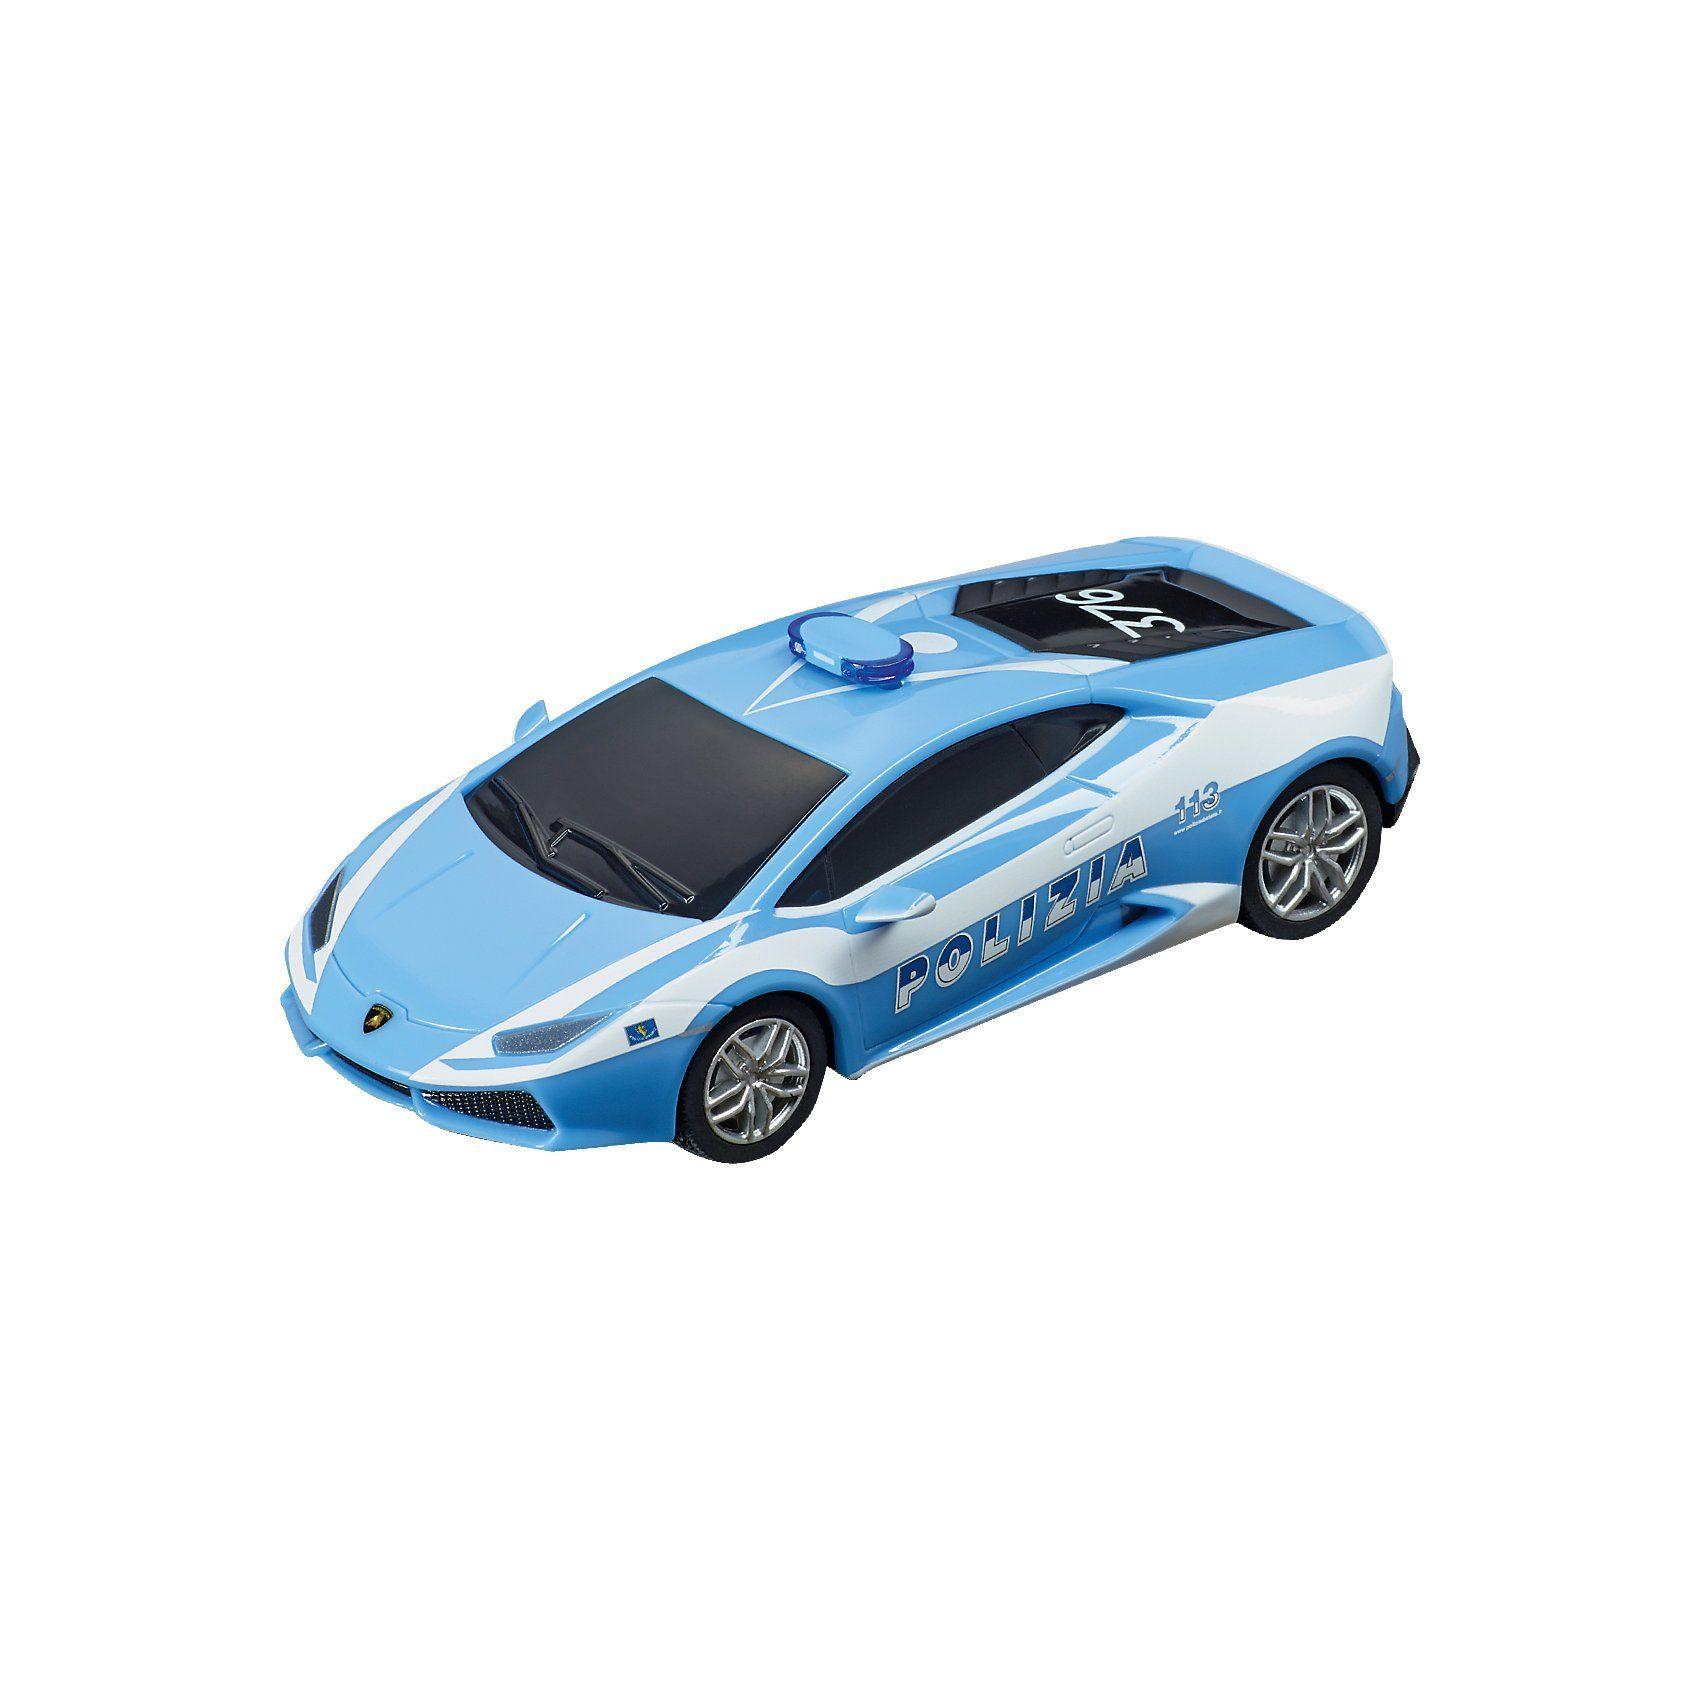 "Carrera GO!!! 64030 Lamborghini Huracán LP 6104 ""Polizia"""